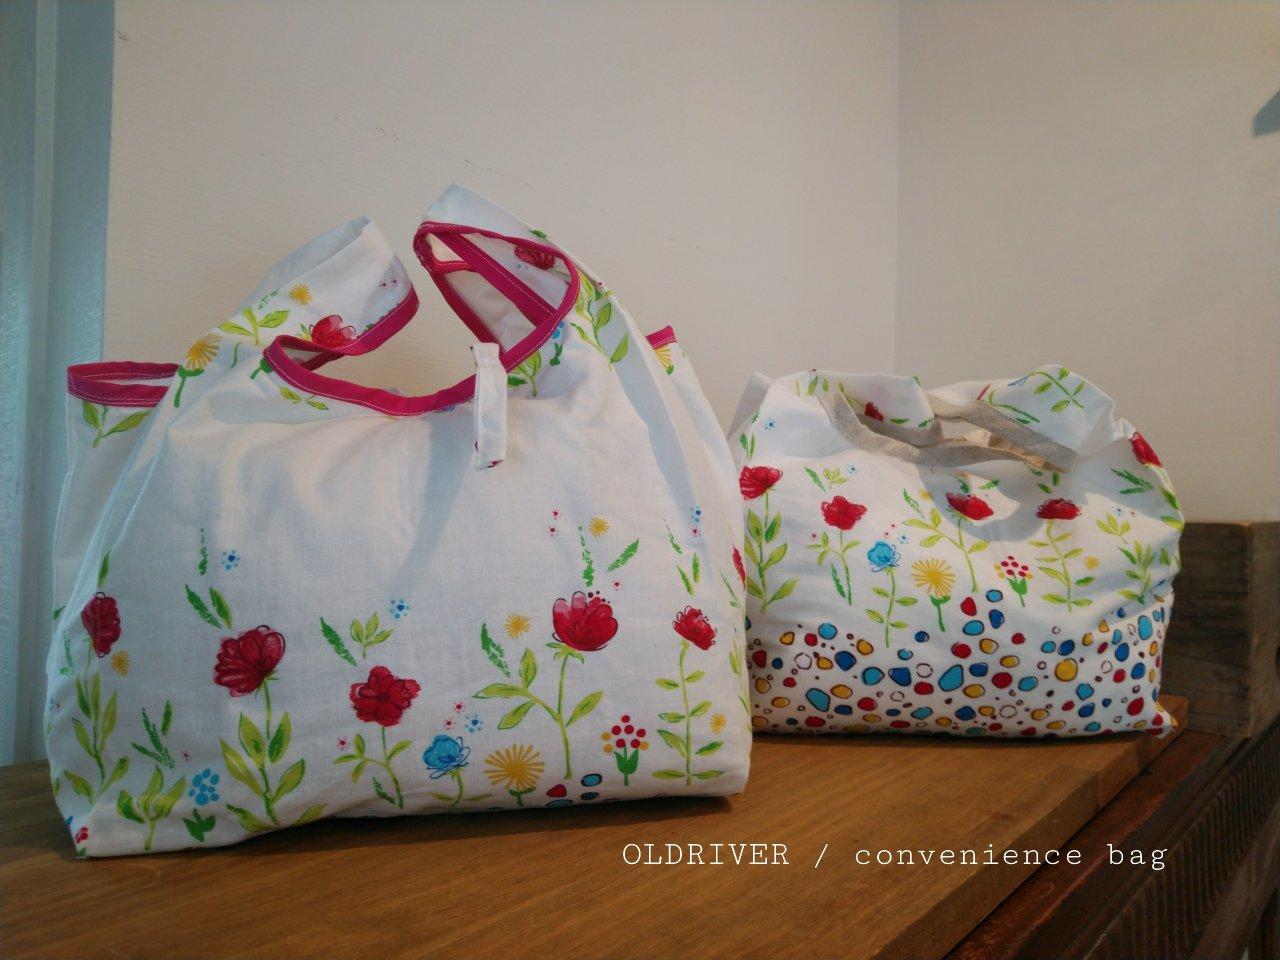 conveniencebag_f0255704_15392938.jpg